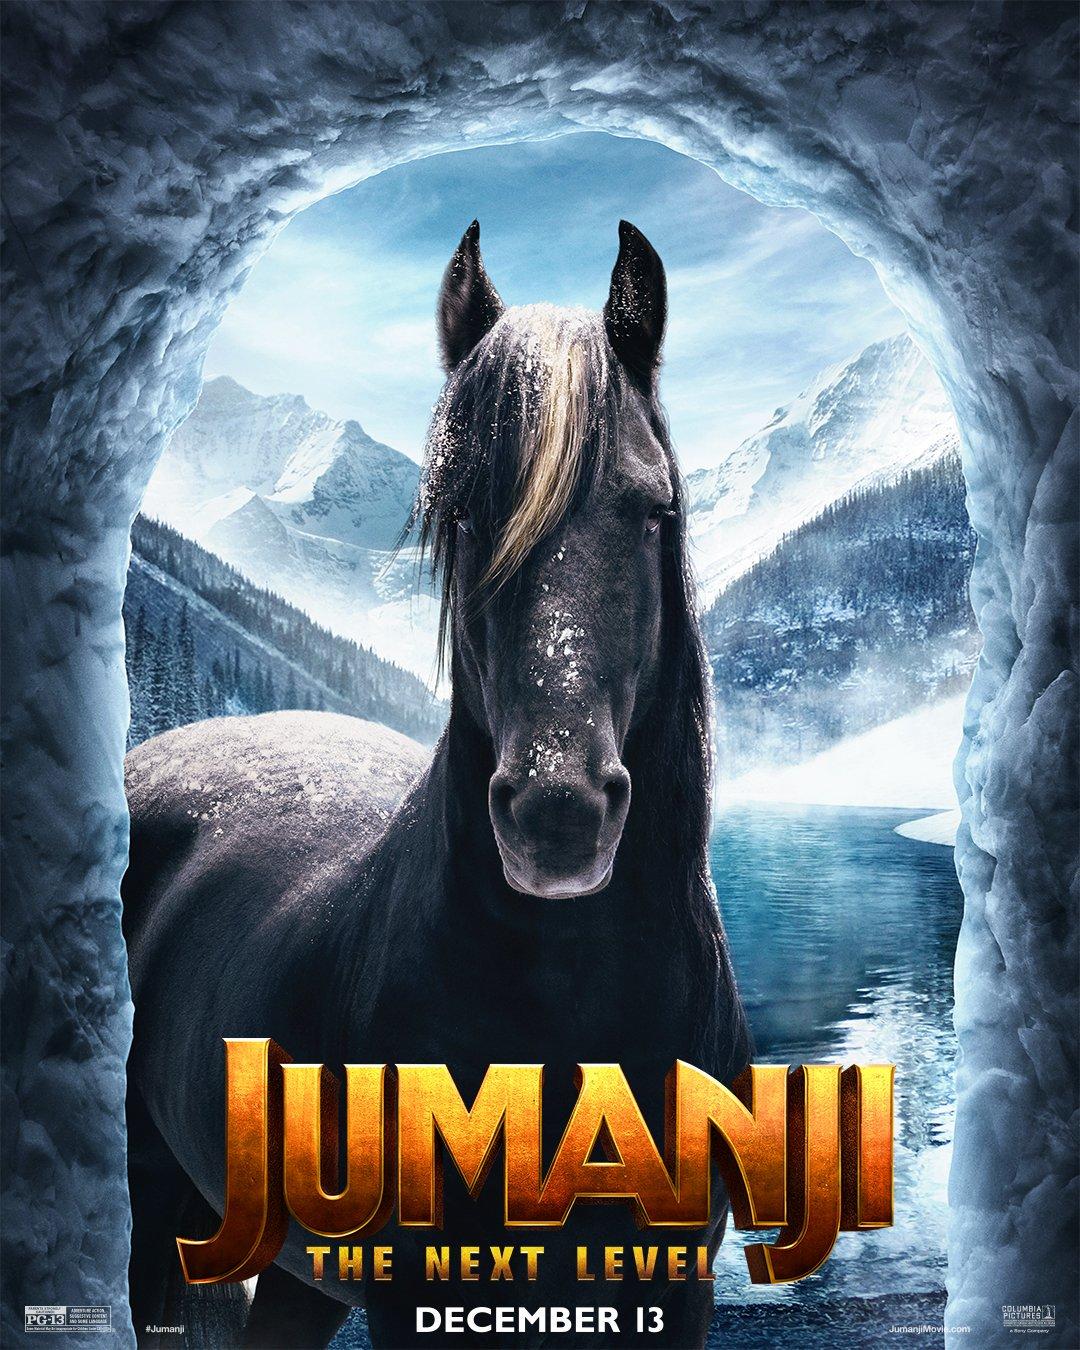 Jumanji: The Next Level (2019) Poster - The Horse